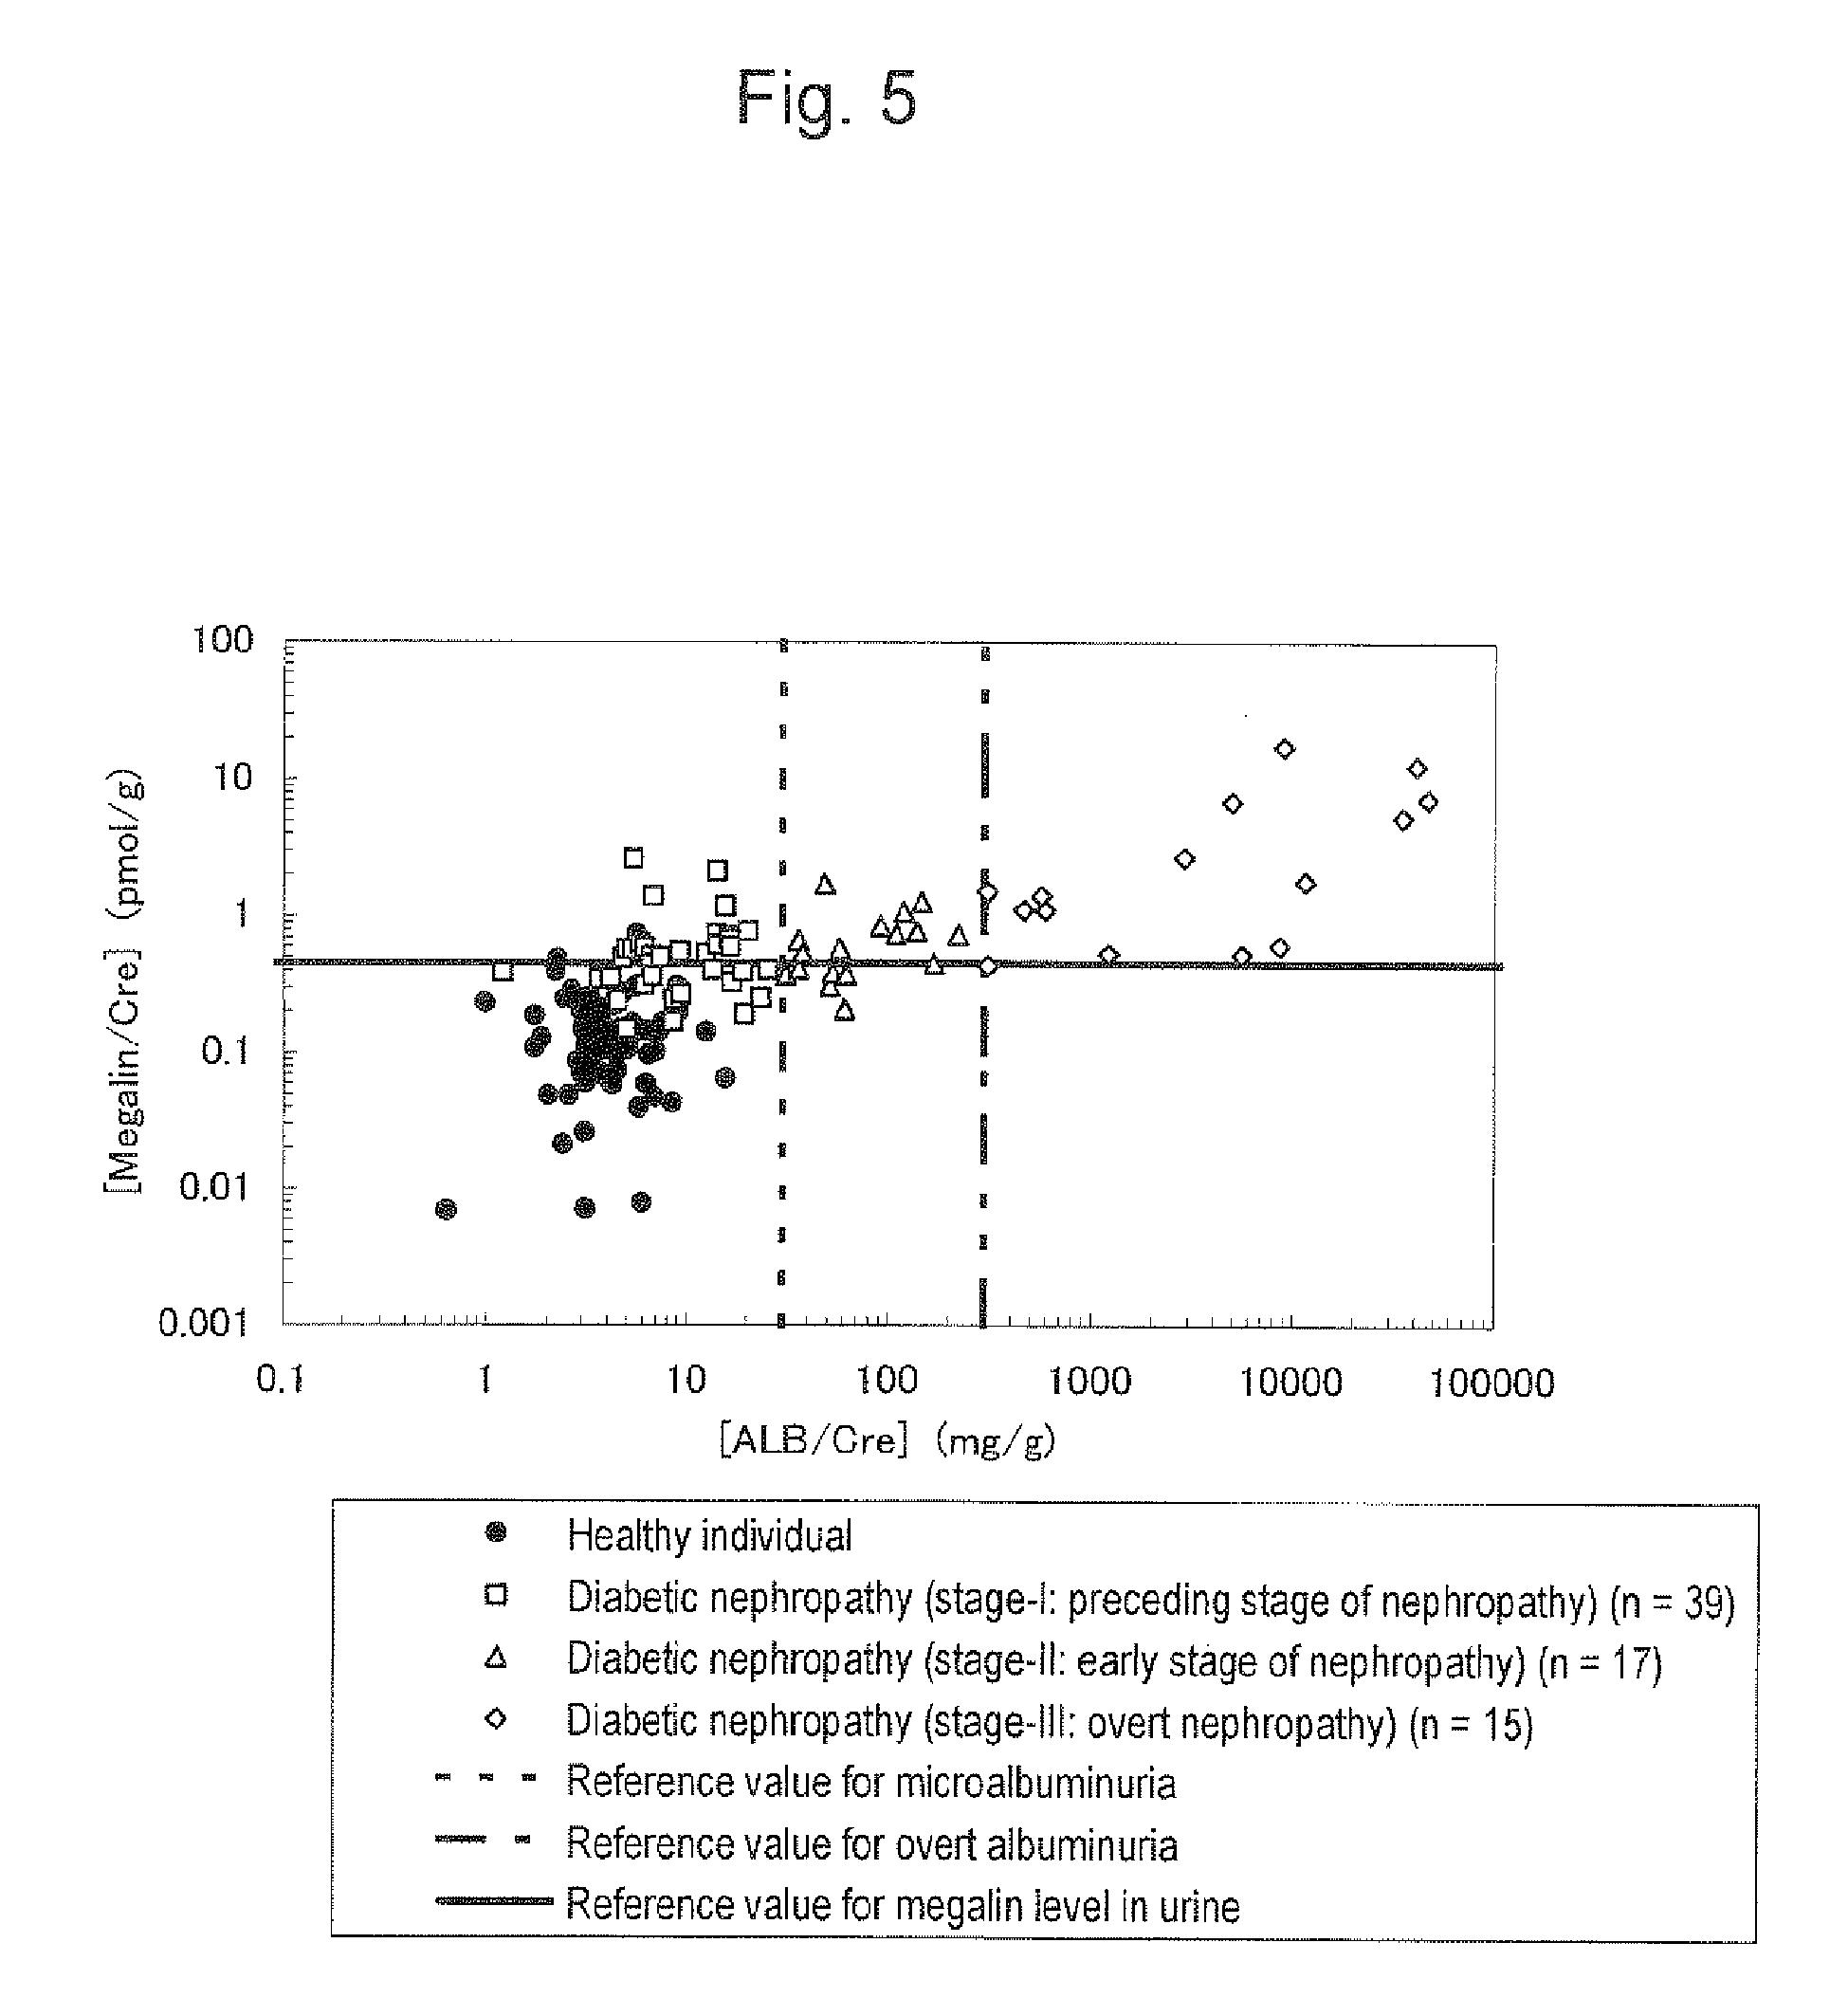 Código icd-9 para diabetes con microalbuminuria vs proteinuria